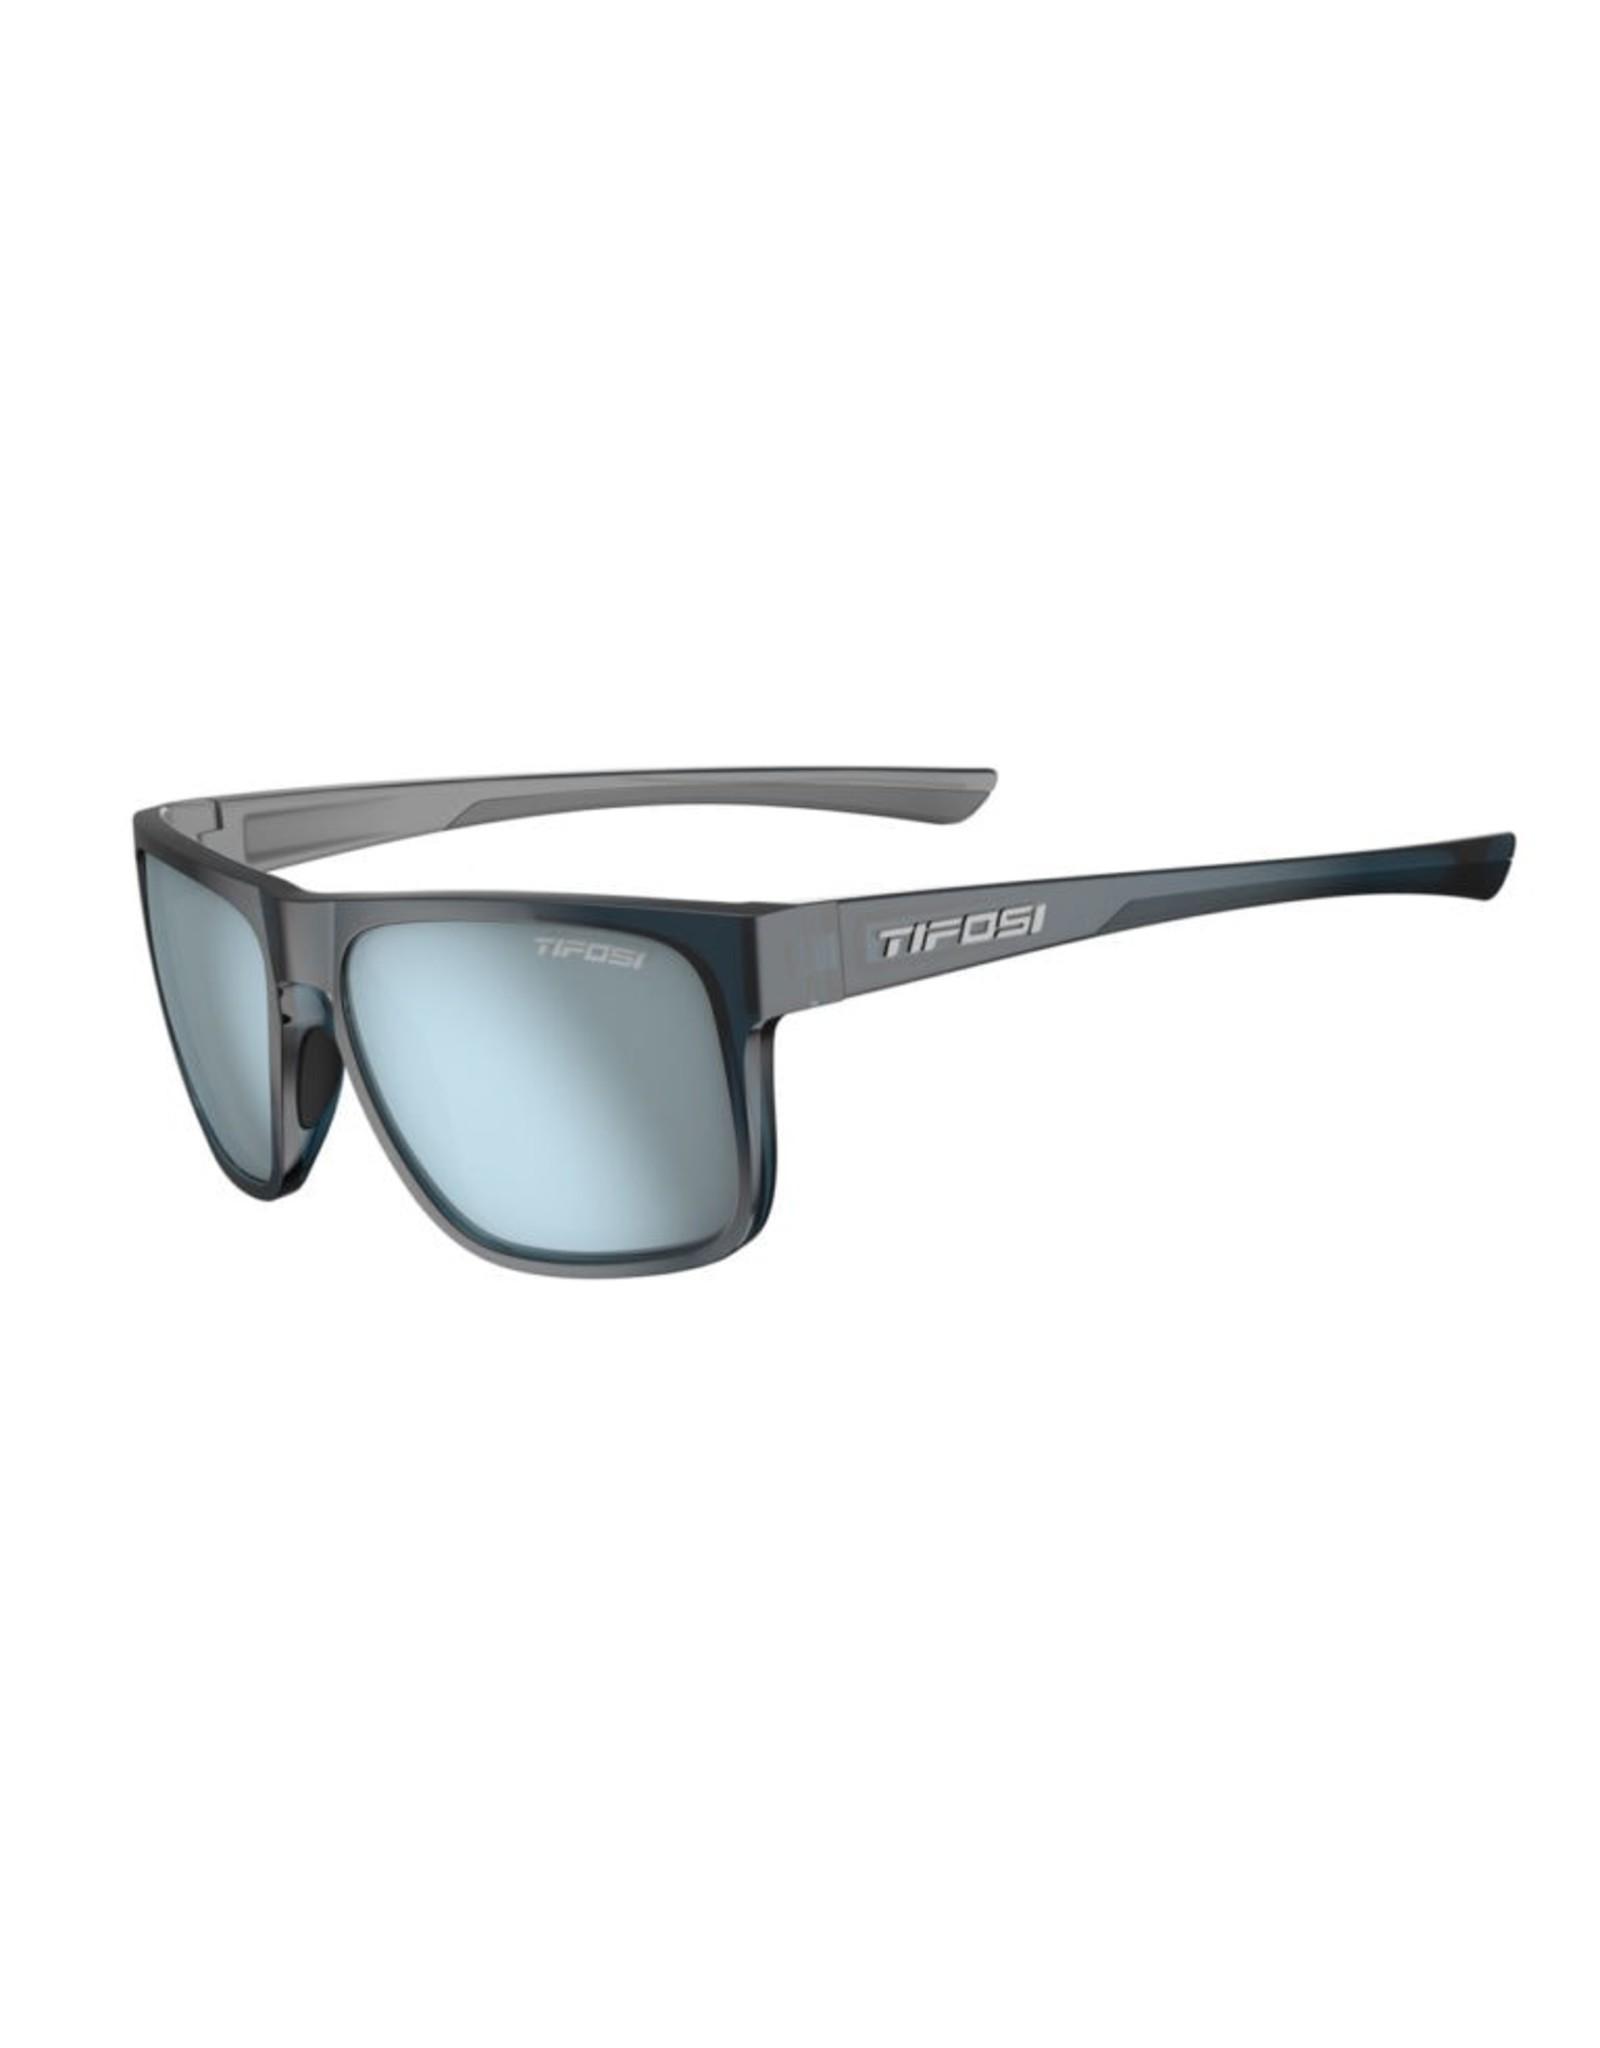 Tifosi Optics Swick, Midnight Navy Single Lens Sunglasses - Smoke Bright Blue